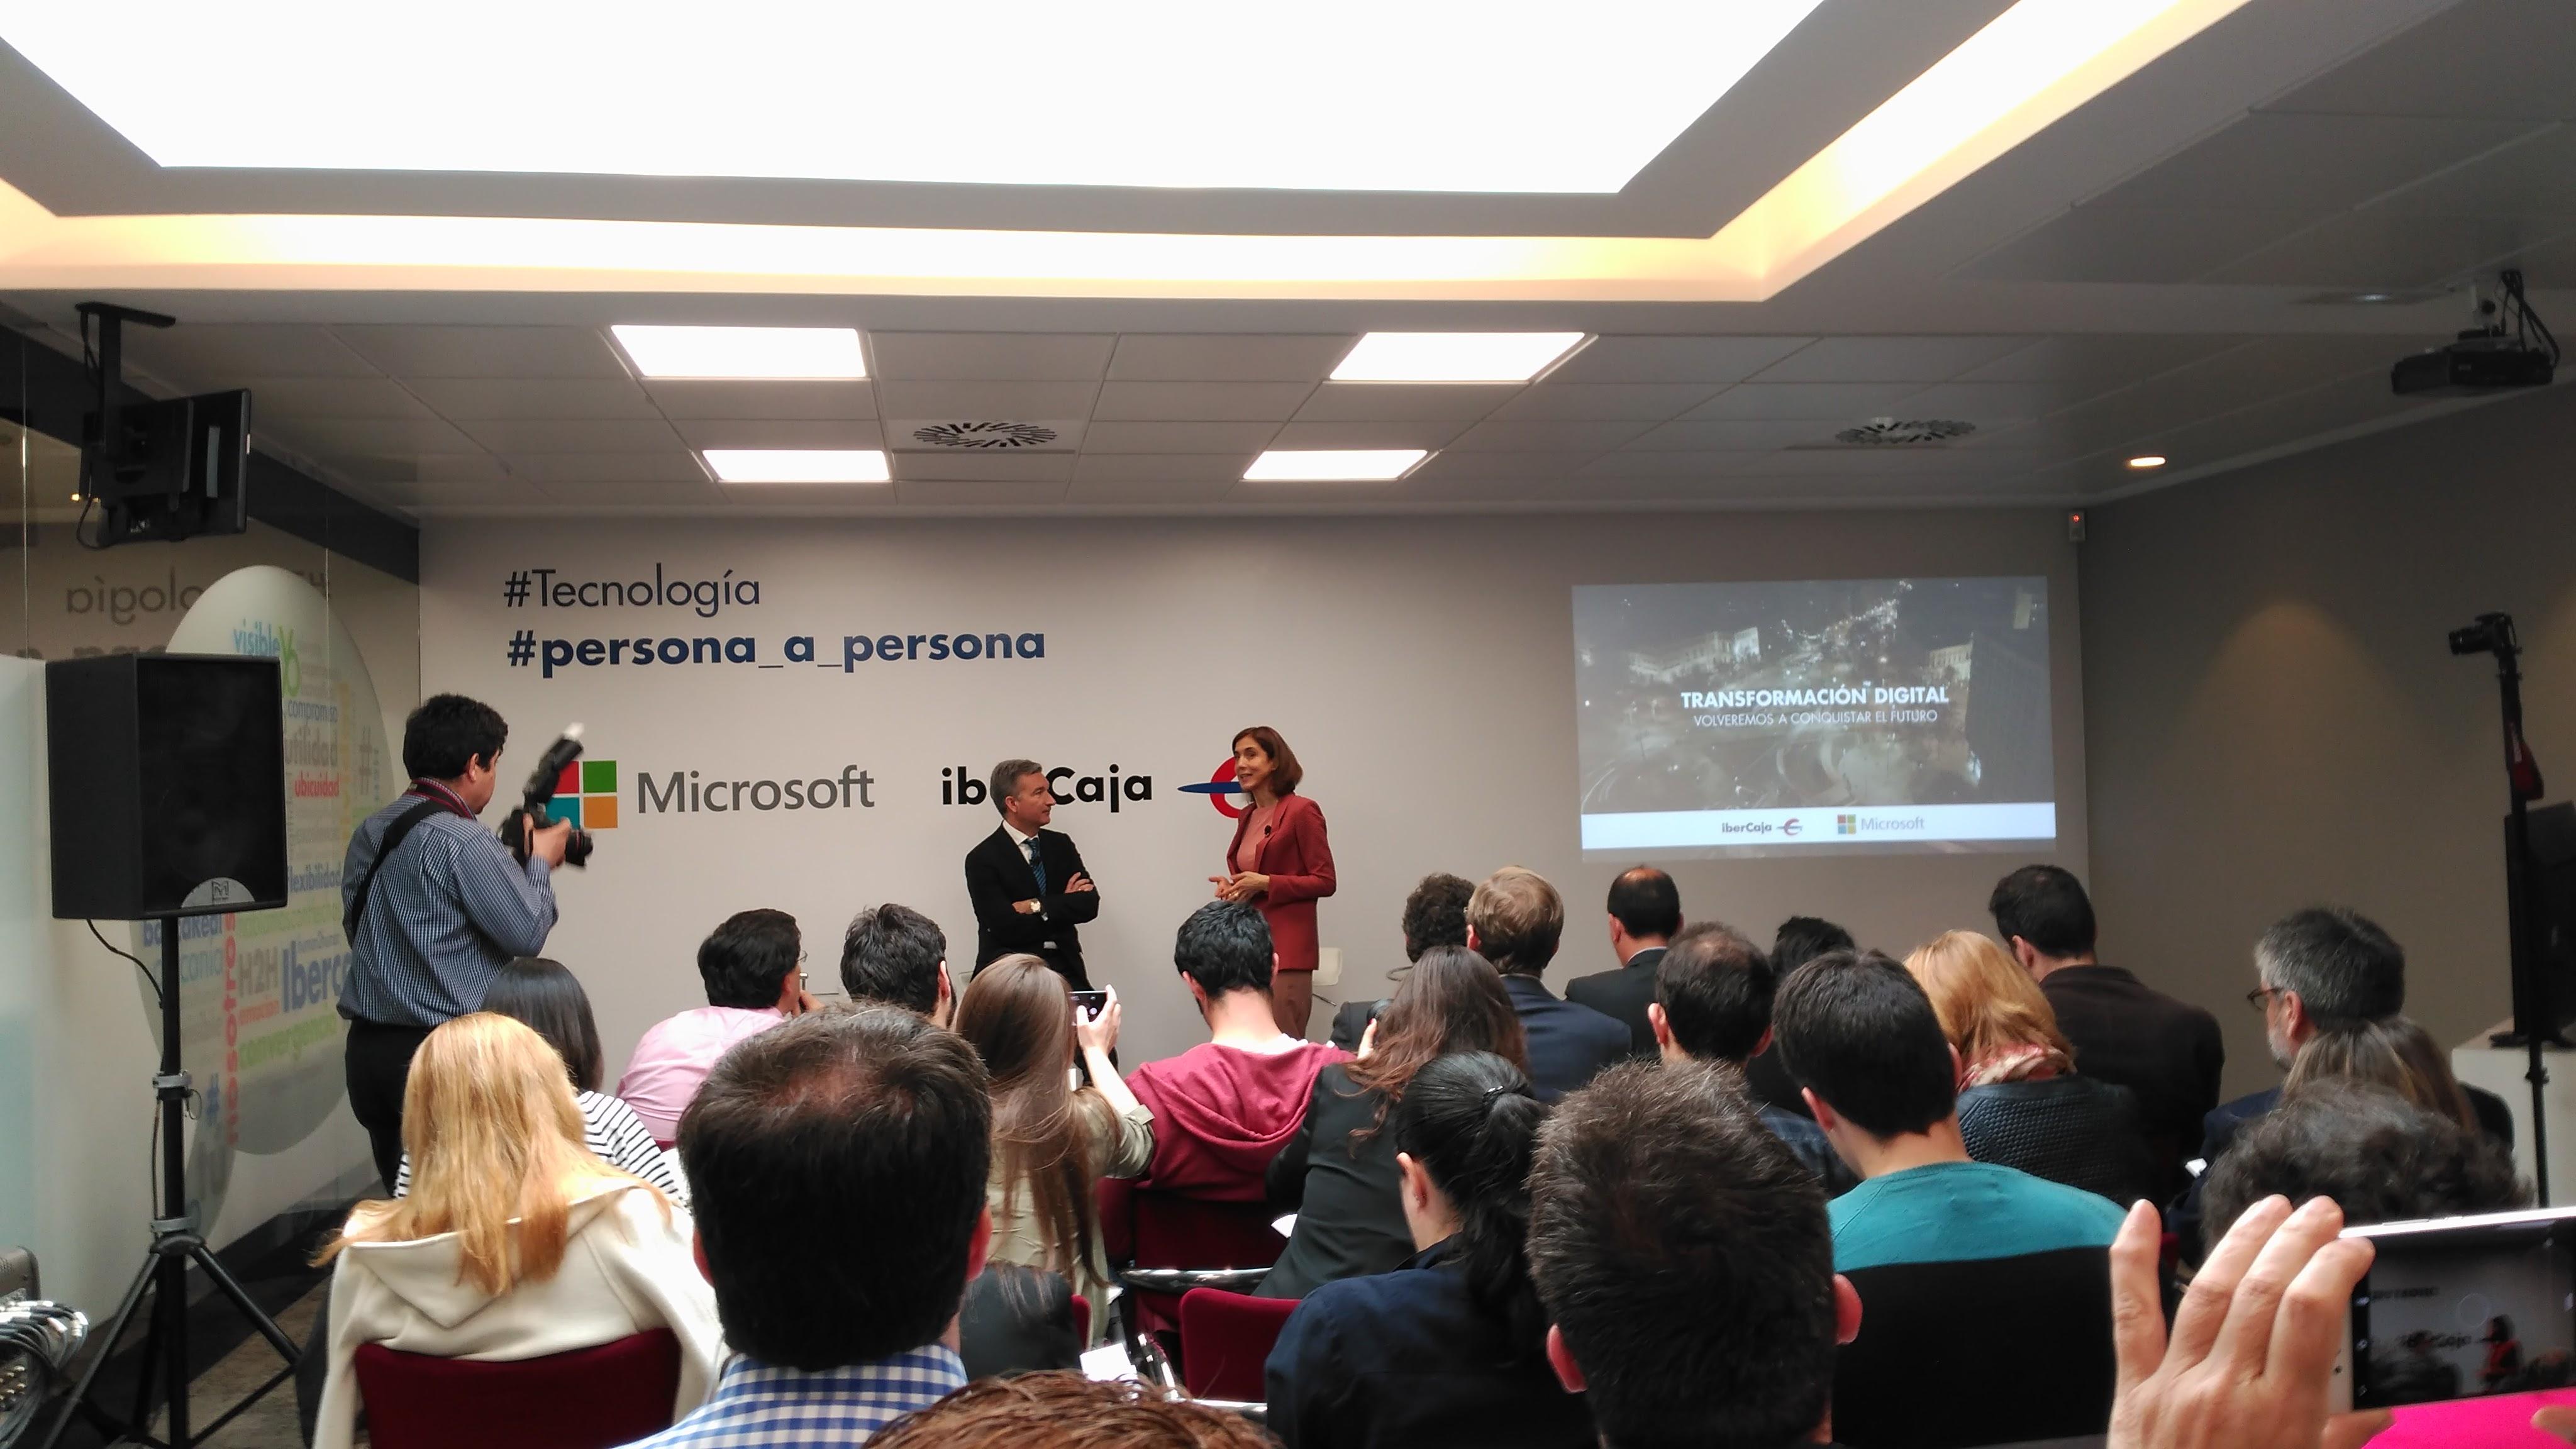 Pilar López y Víctor Iglesias respondiendo a la prensa